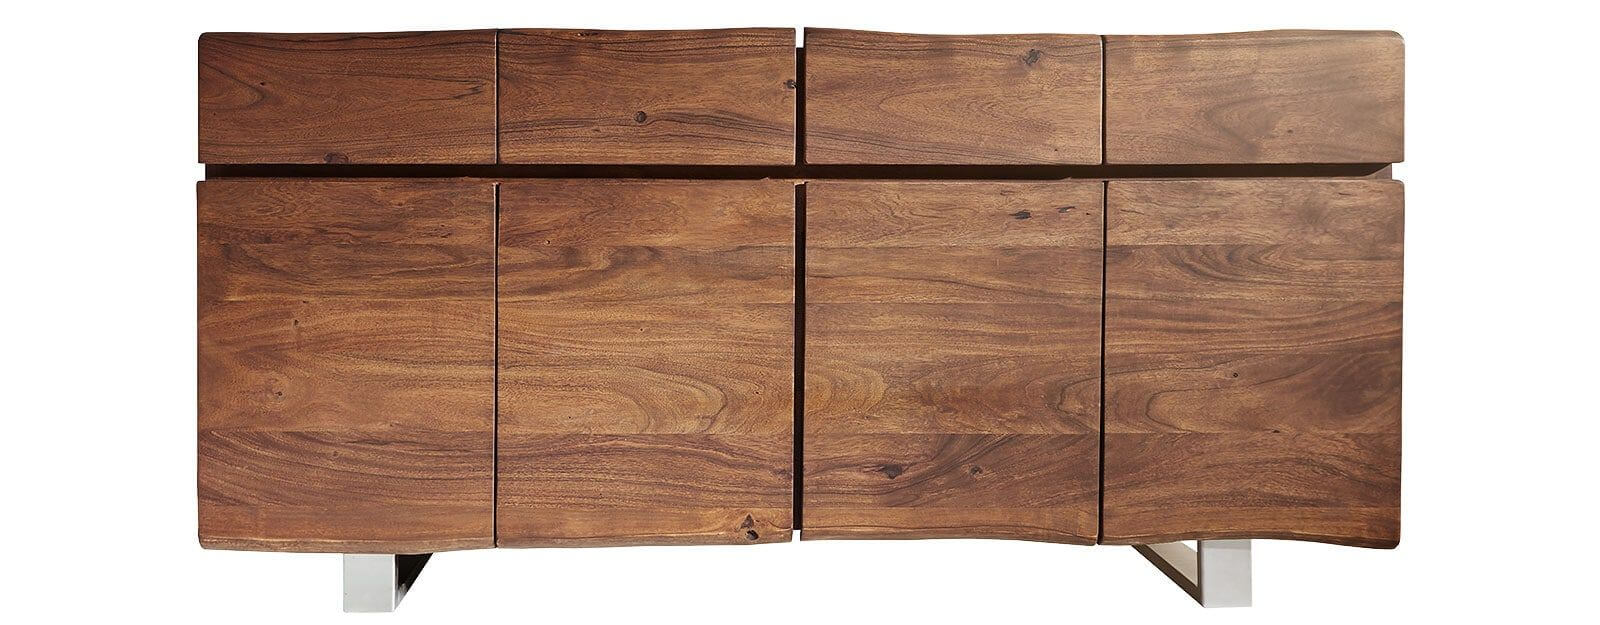 Live-Edge dressoirs in bruin